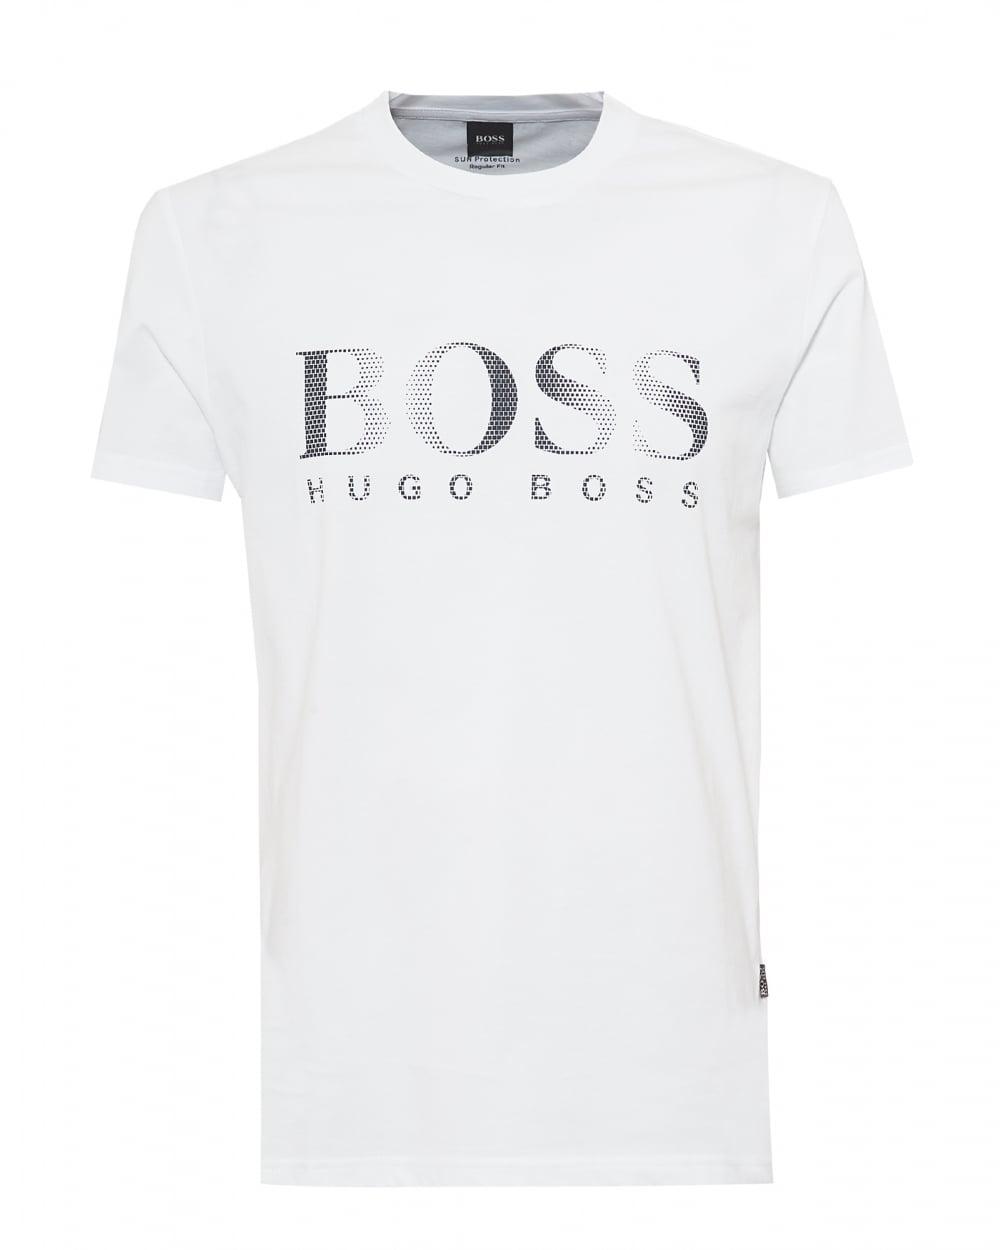 Mens T-Shirt RN UV Protection T-Shirt, Large Logo White Tee